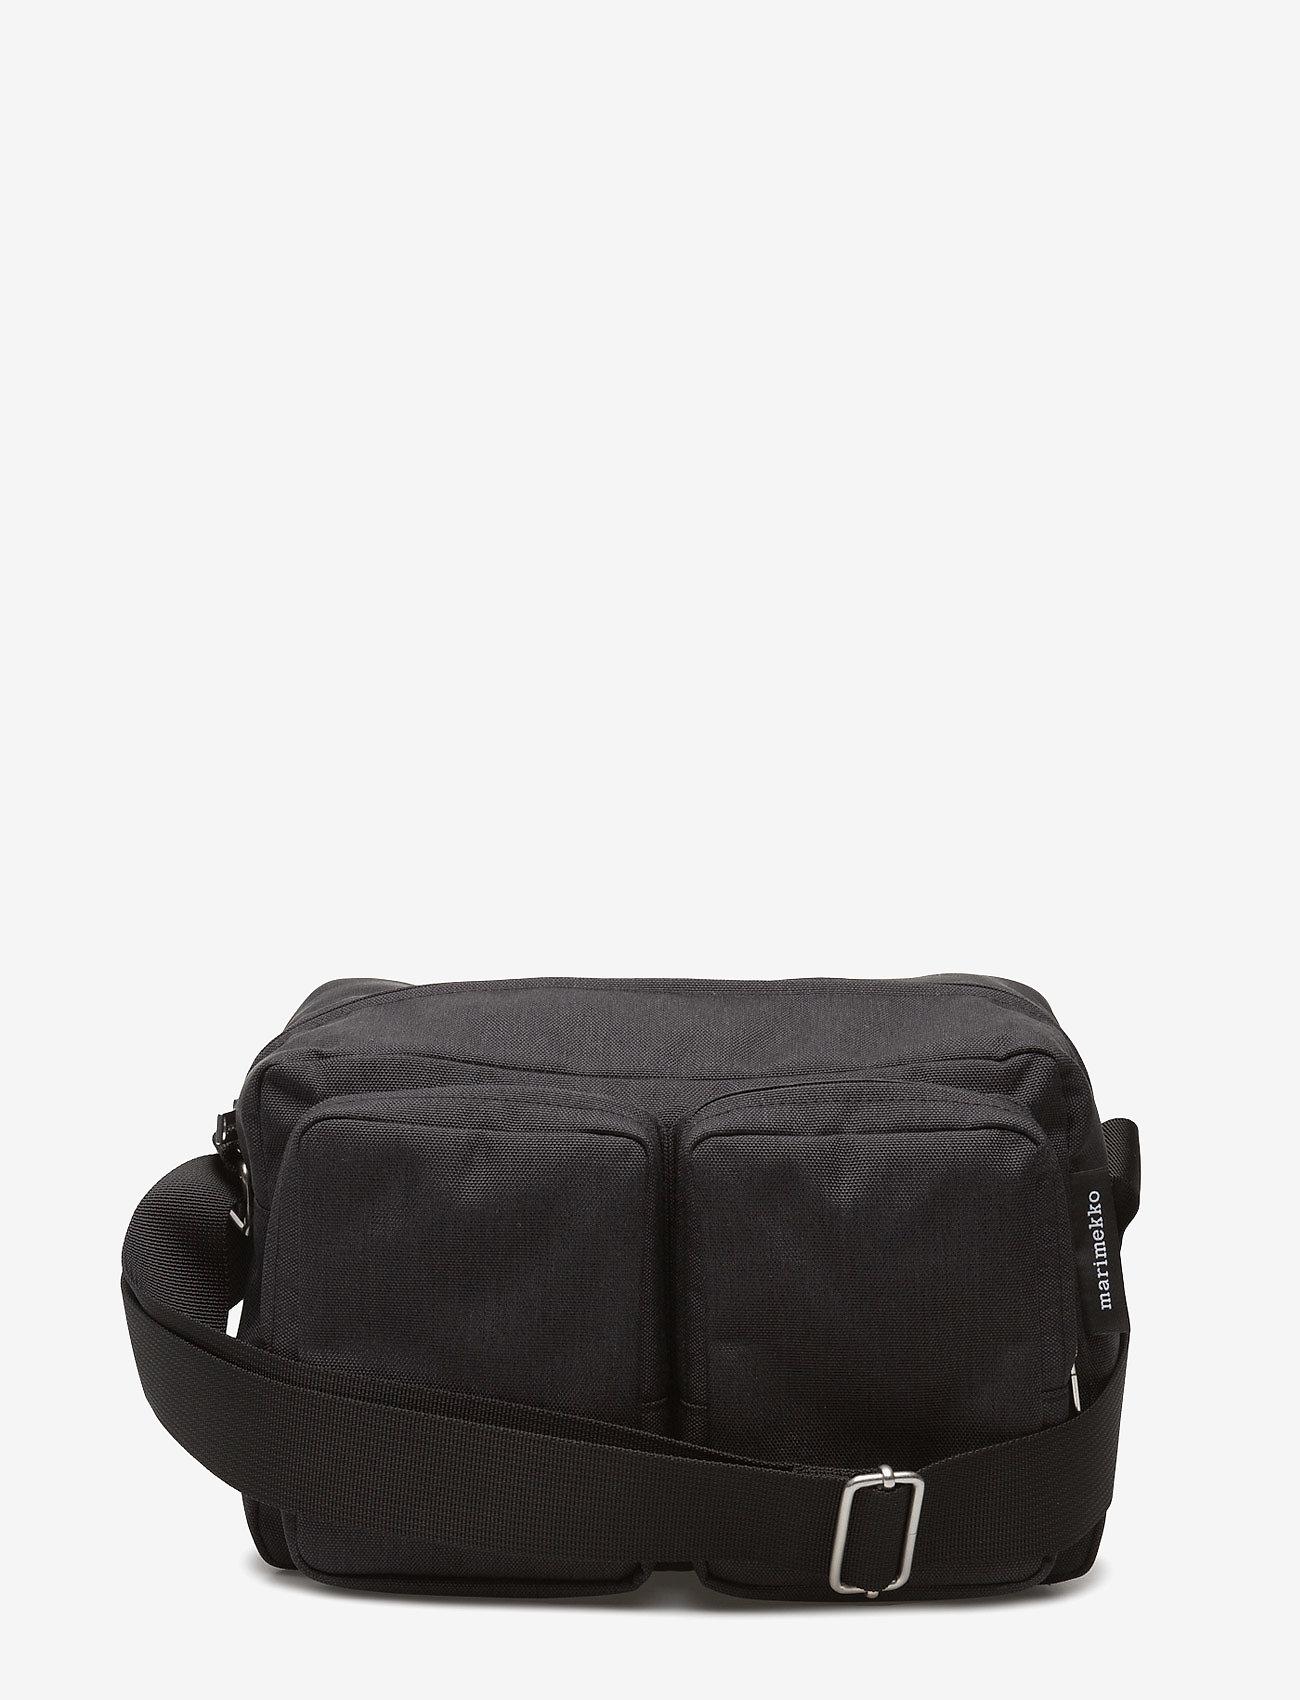 Marimekko - KORTTELI SHOULDER BAG - crossbody bags - black - 0